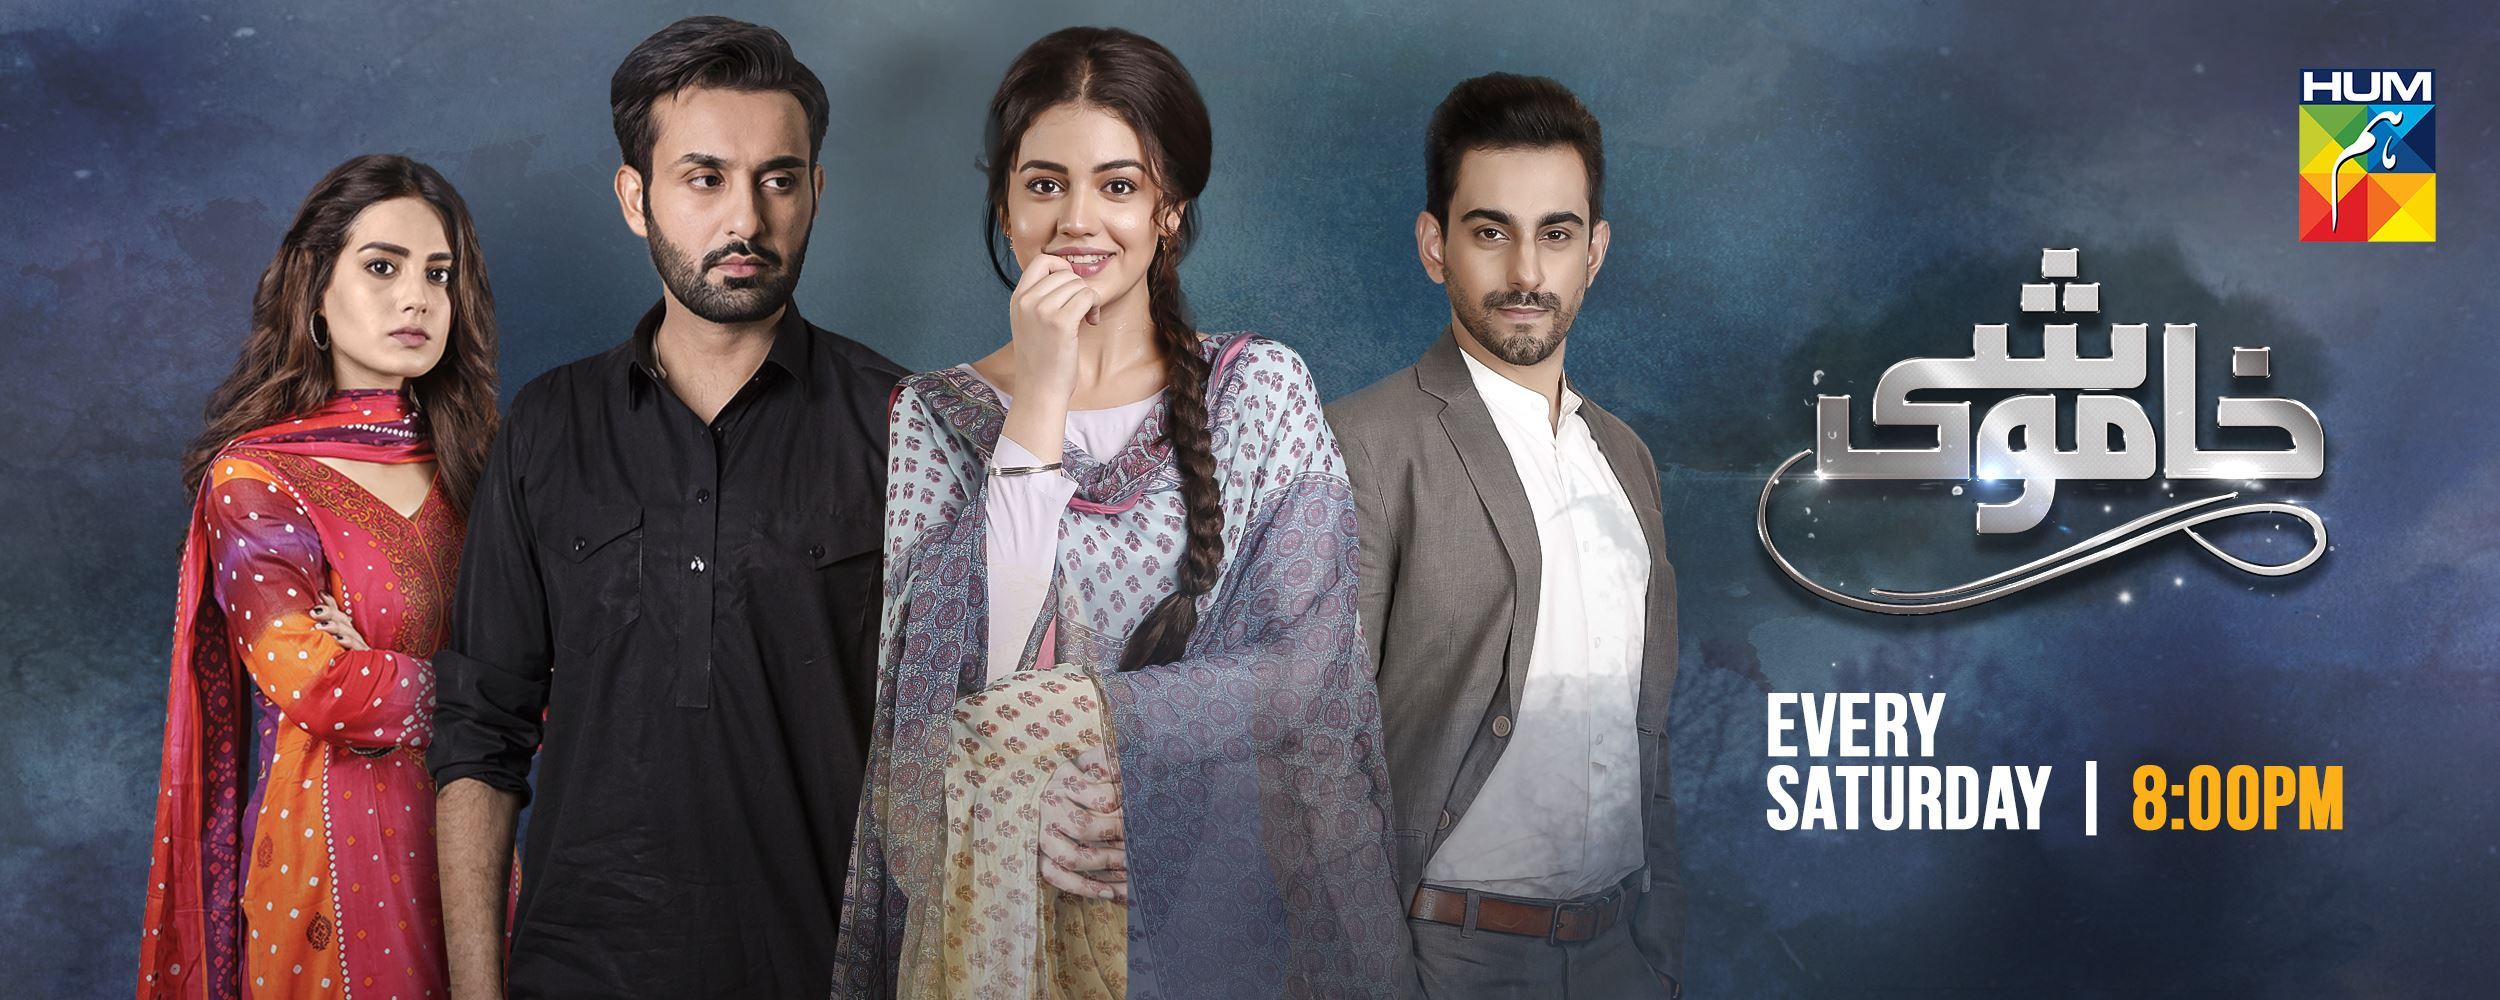 Hum TV Drama Khamoshi Is Still Going Strong